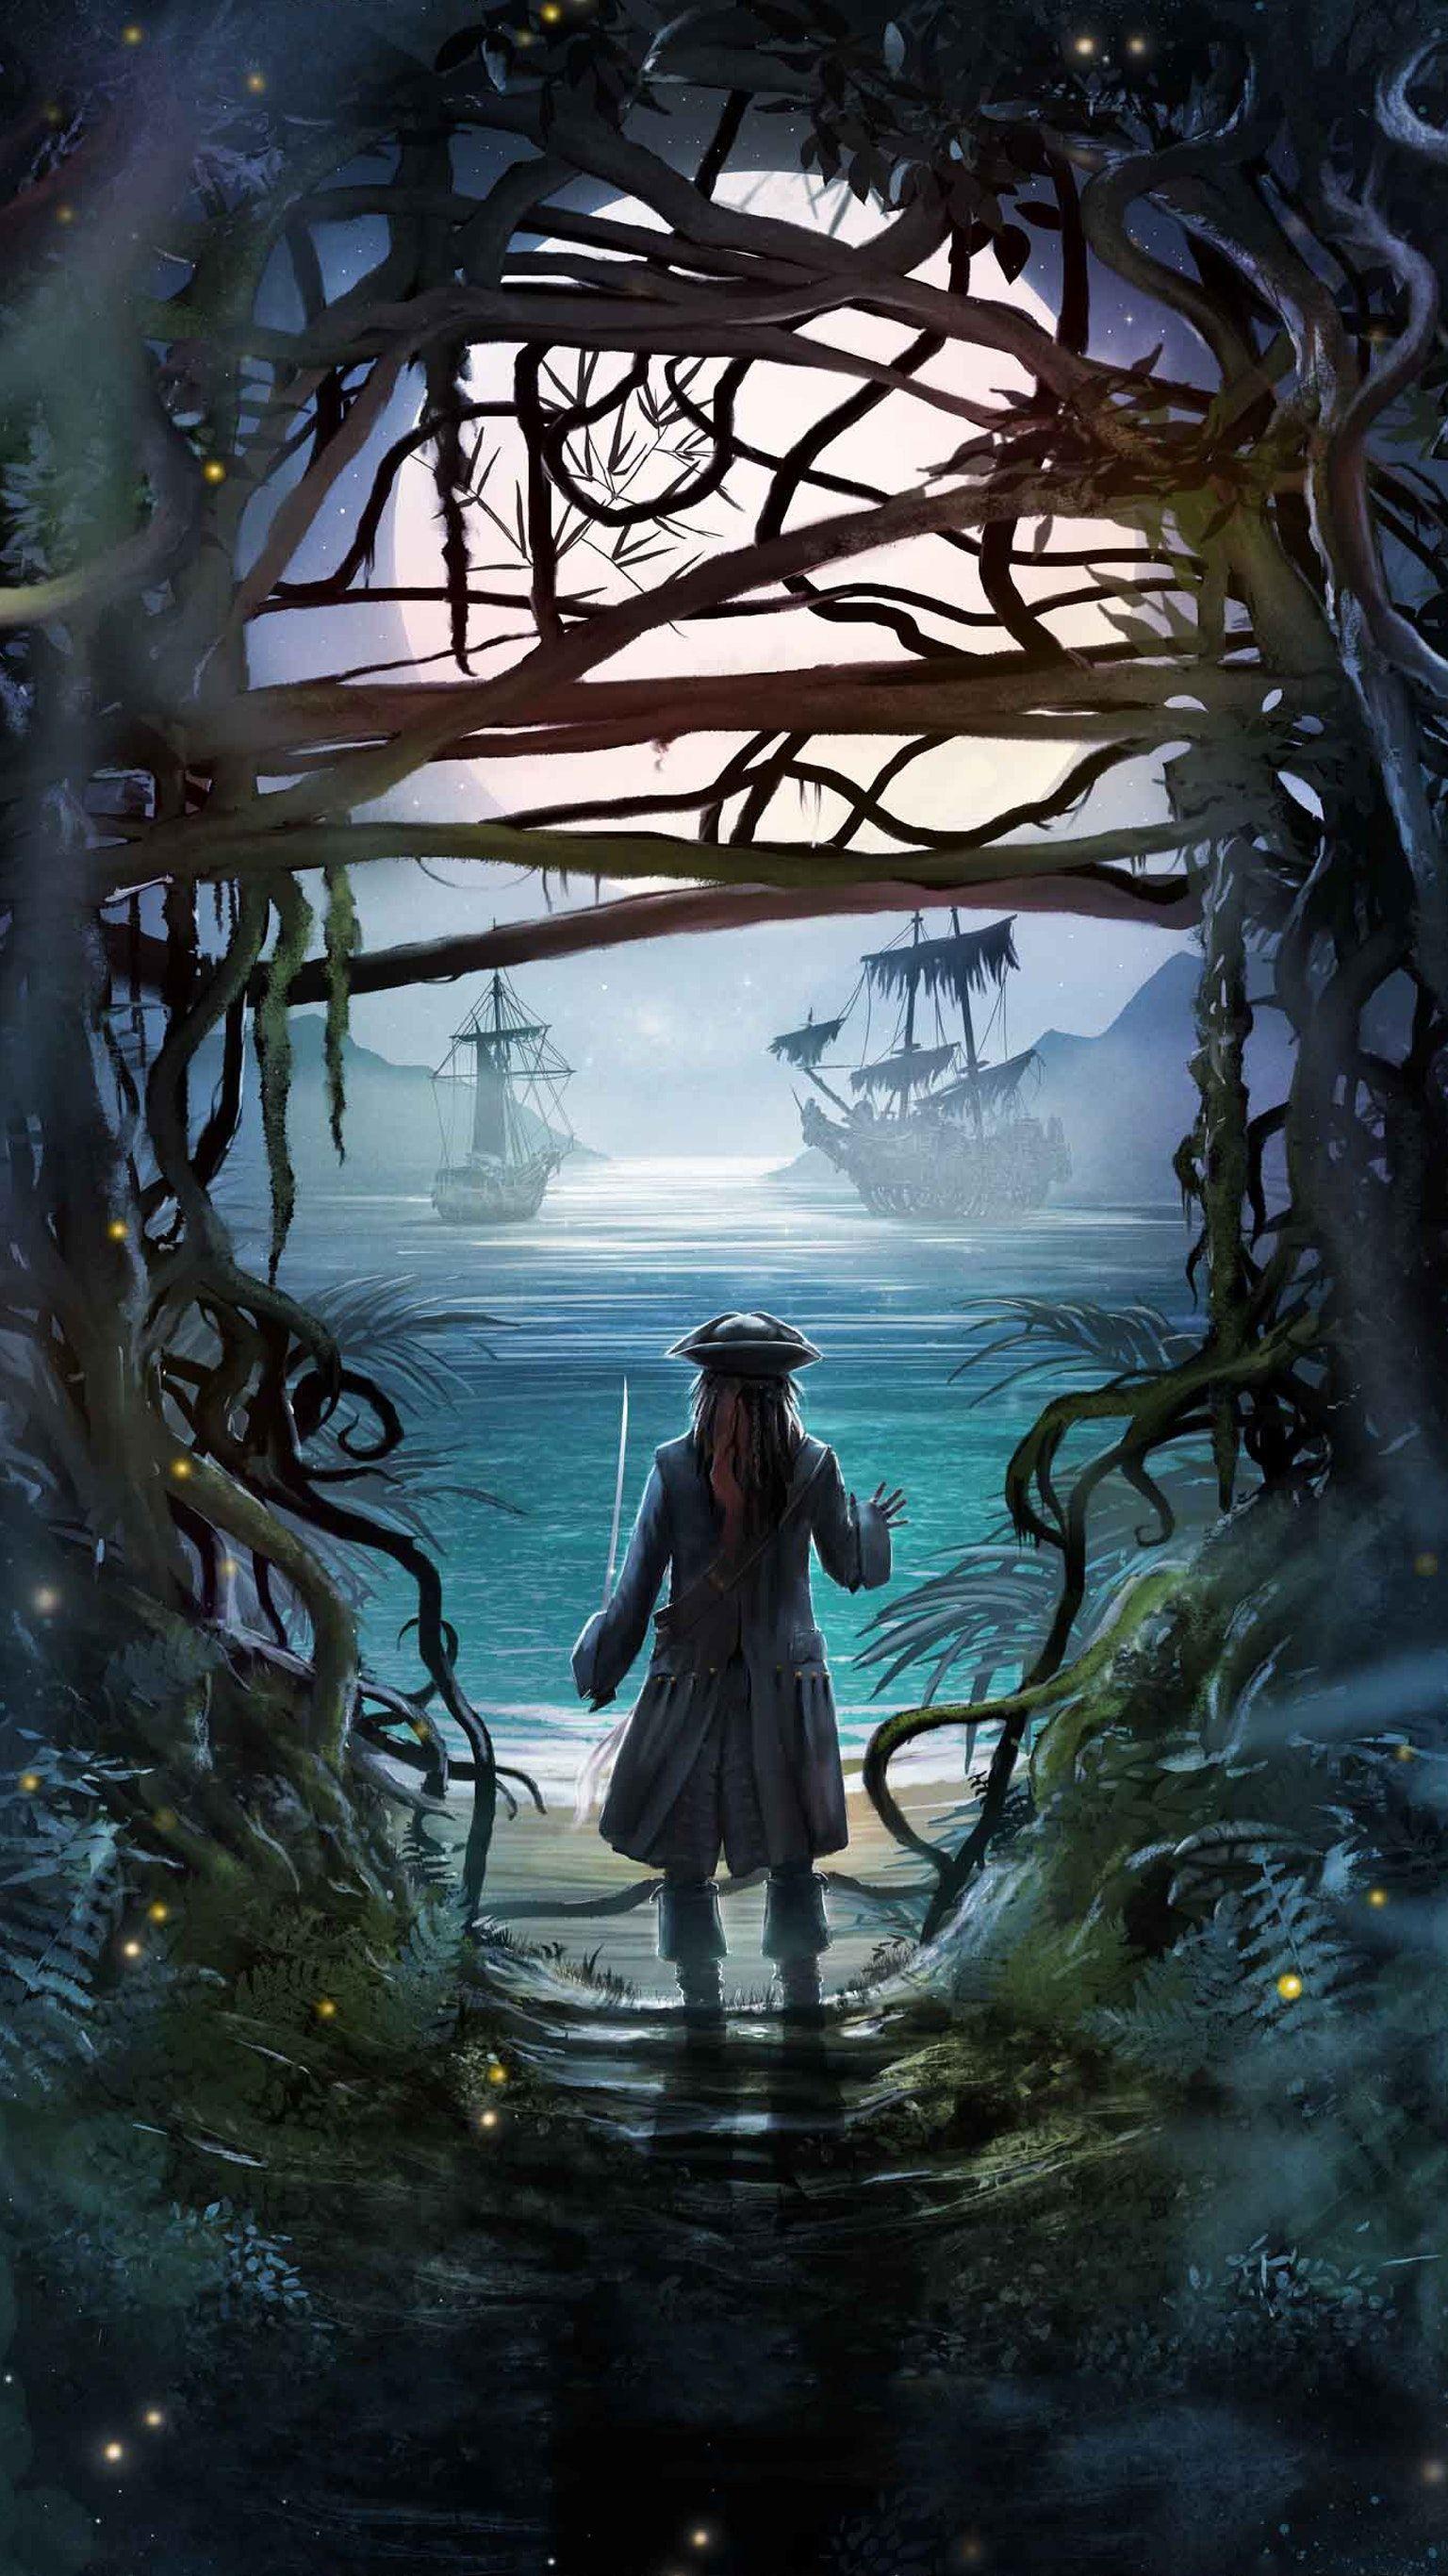 Pirates of the Caribbean: Dead Men Tell No Tales (2017) Phone Wallpaper | Moviemania